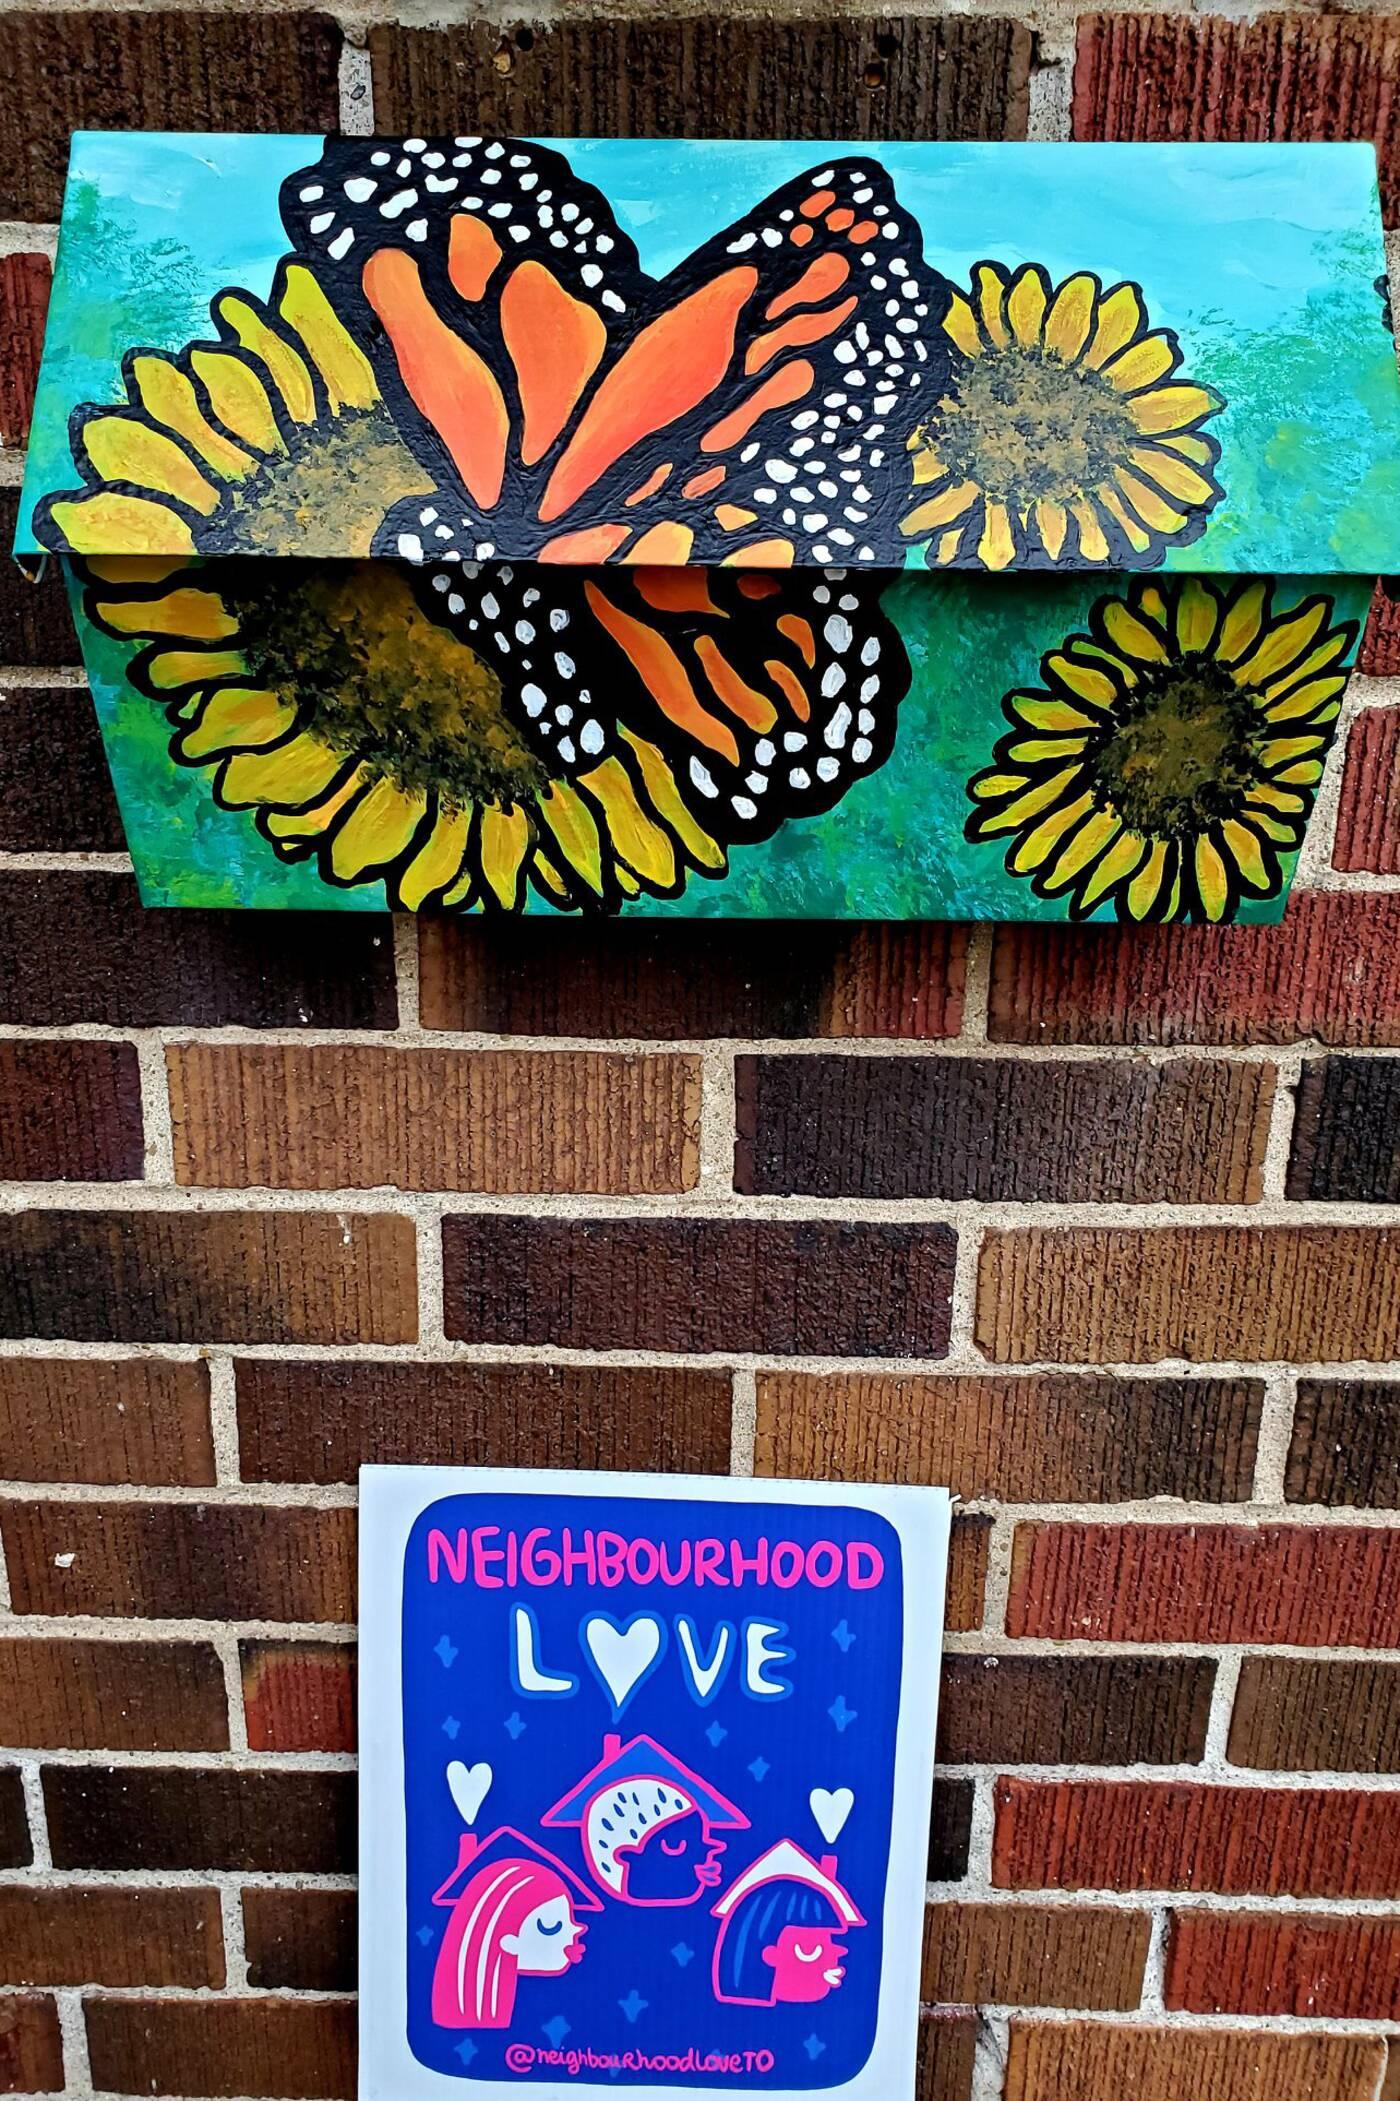 neighbourhood love to